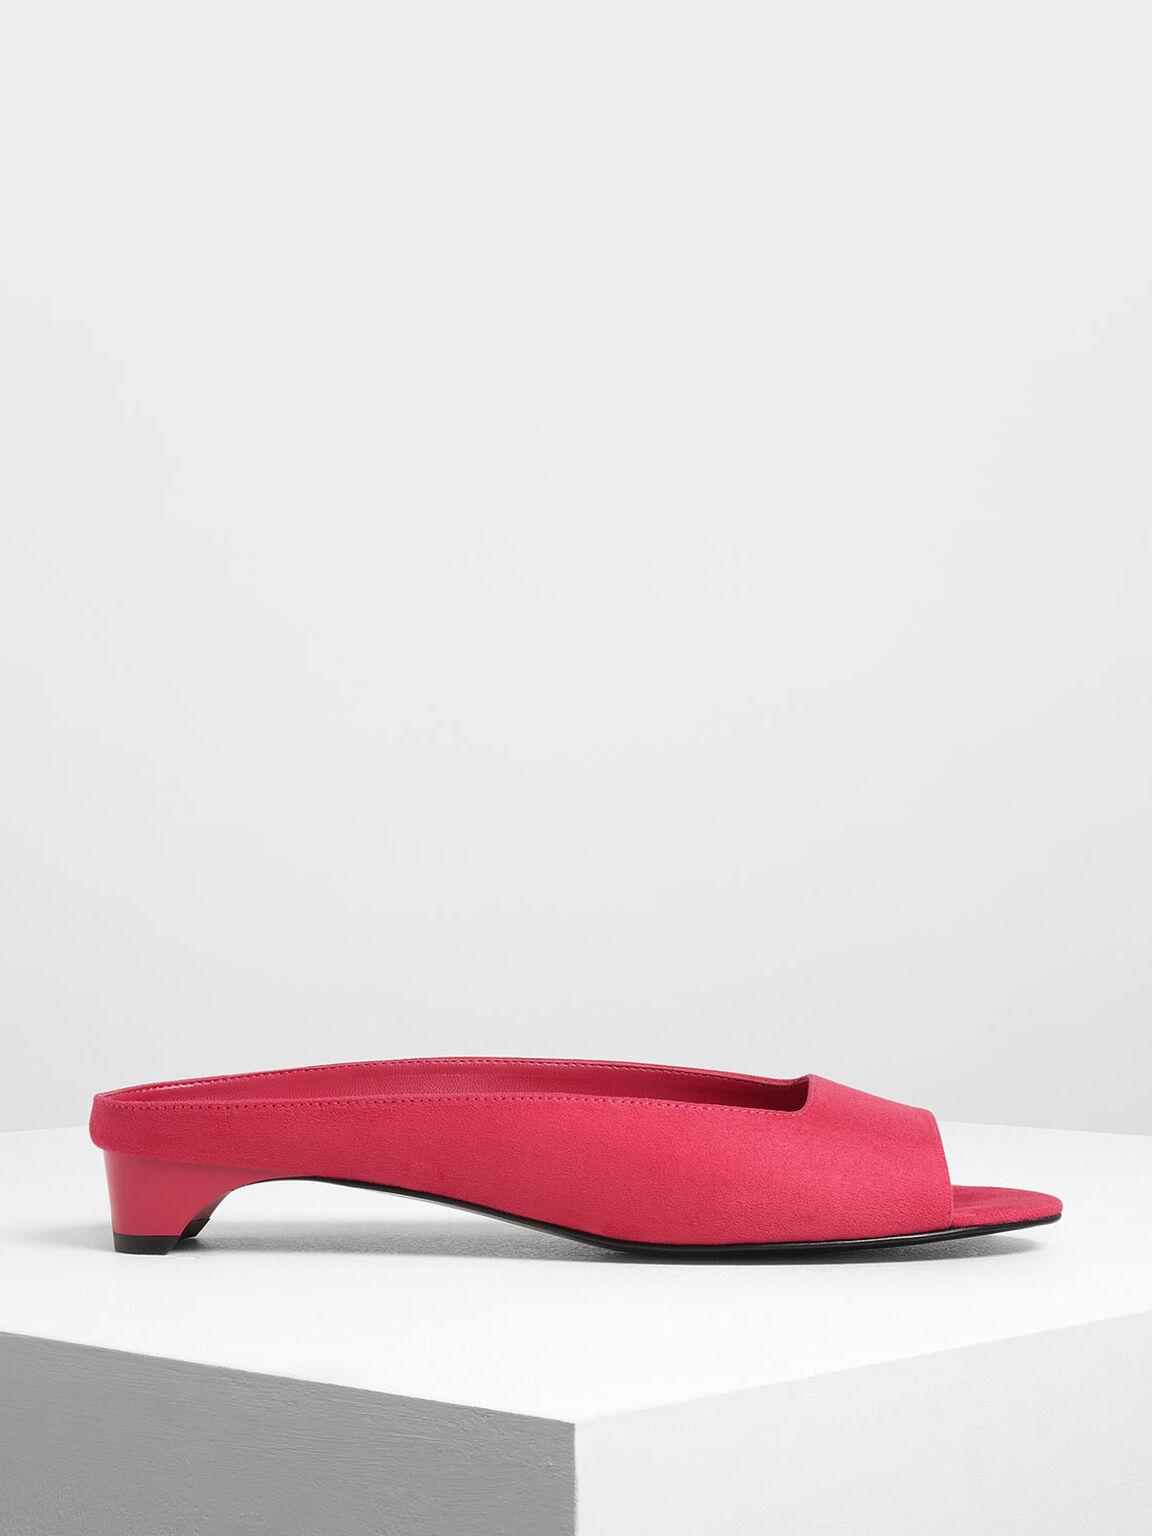 Geometric Cut Kitten Heel Slide Sandals, Red, hi-res